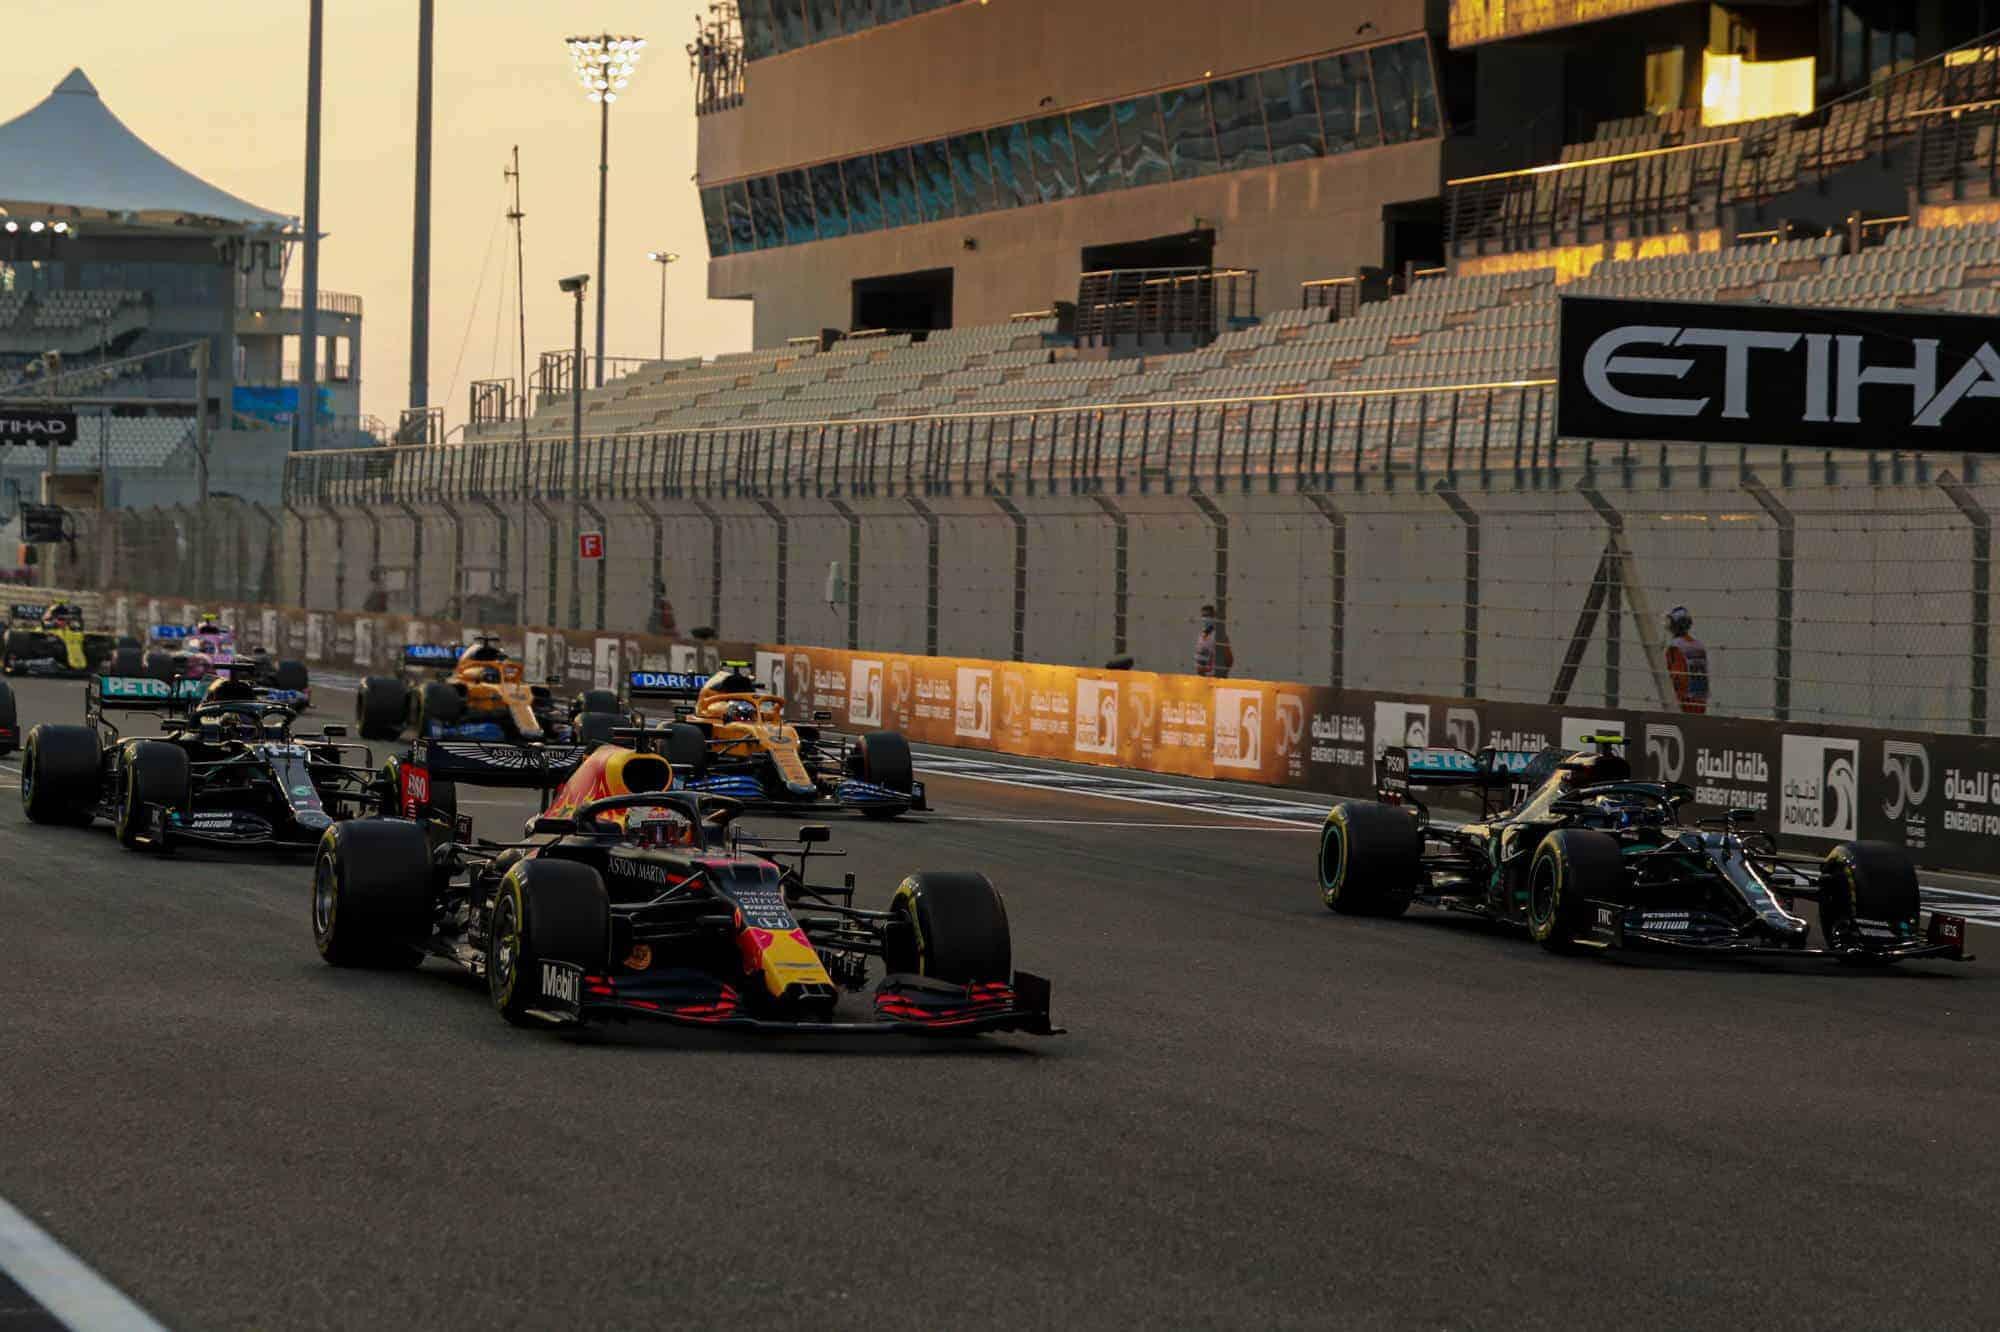 2020 Abu Dhabi GP start of the race Verstappen leads Bottas Hamilton Photo Daimler